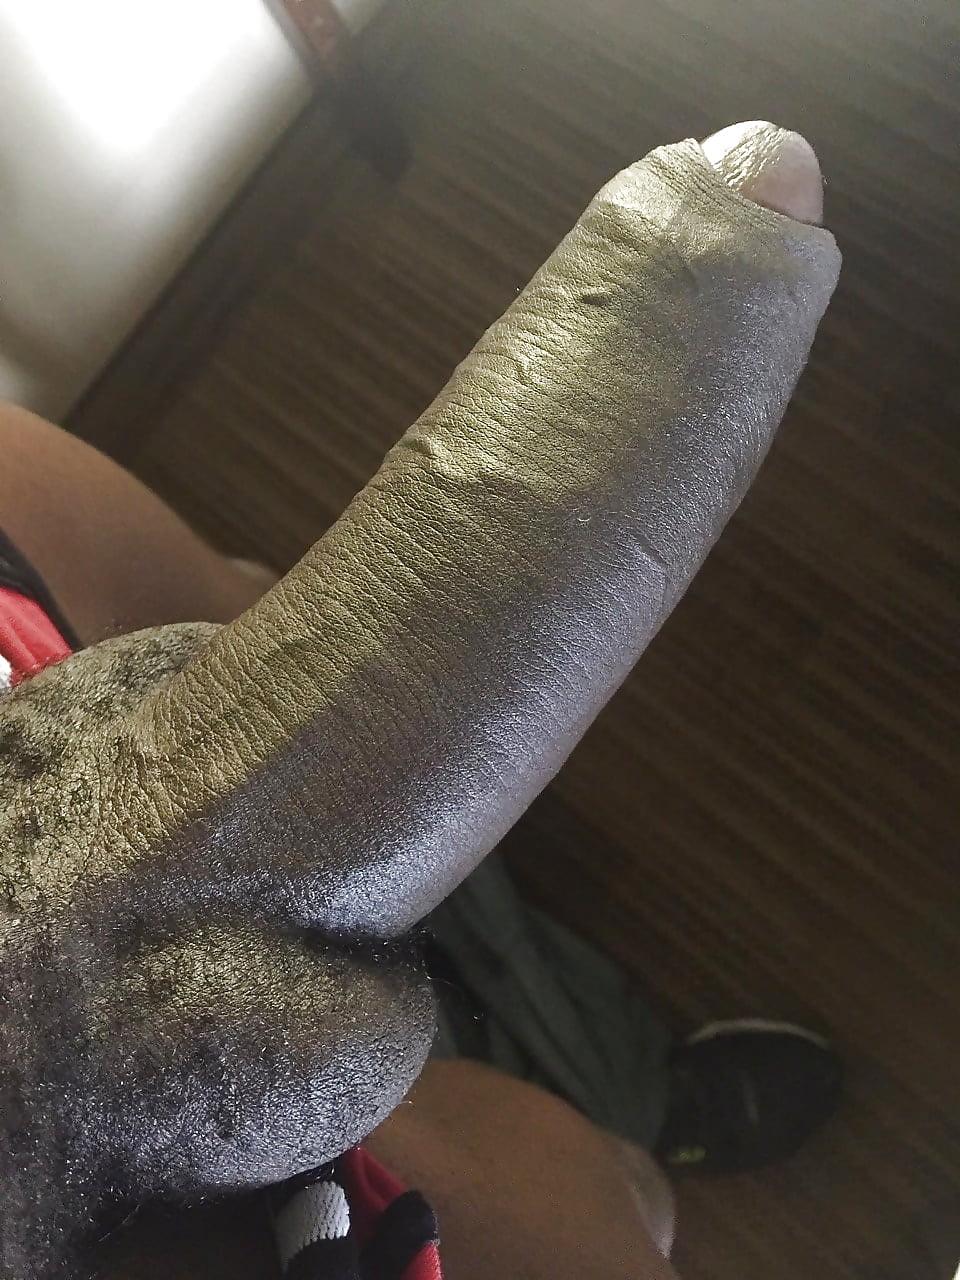 Porn man sucking boobs-5793